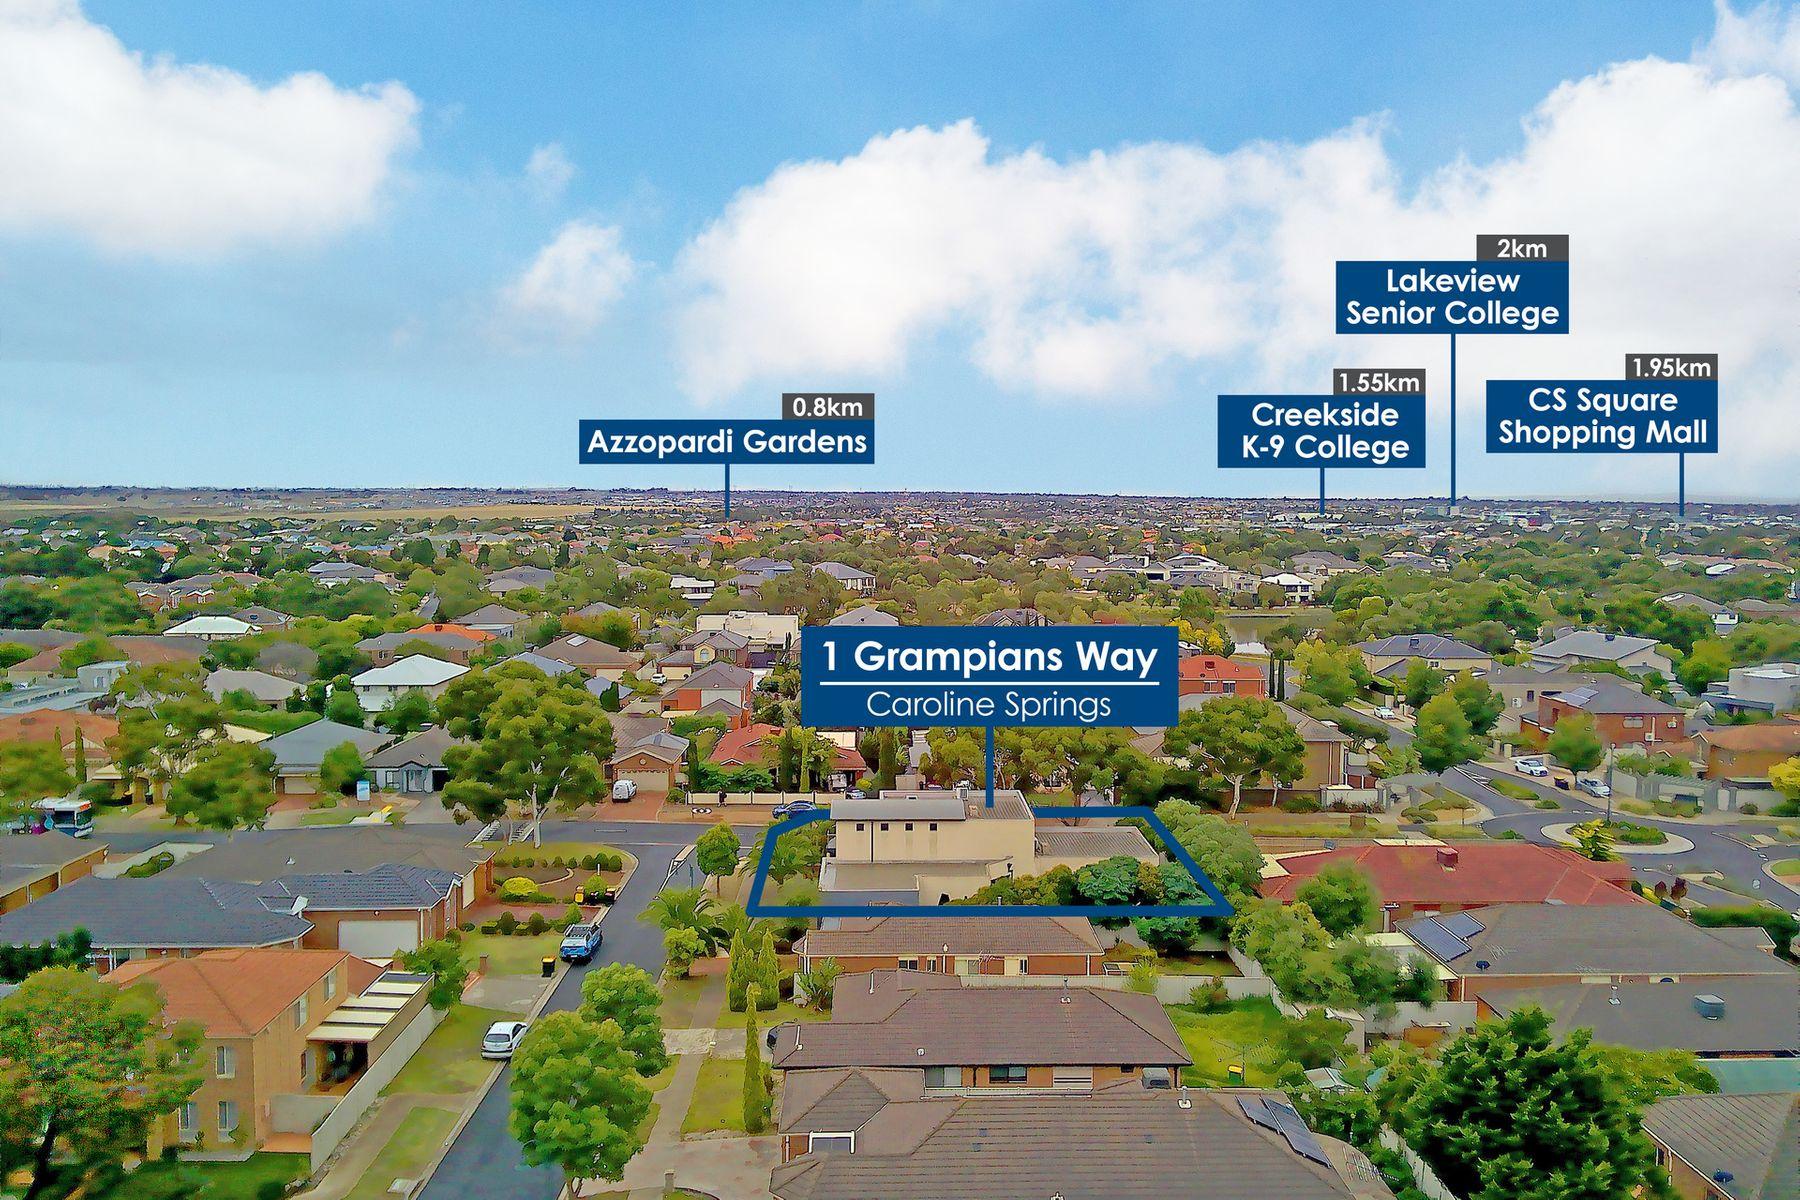 1 Grampians Way, Caroline Springs, VIC 3023